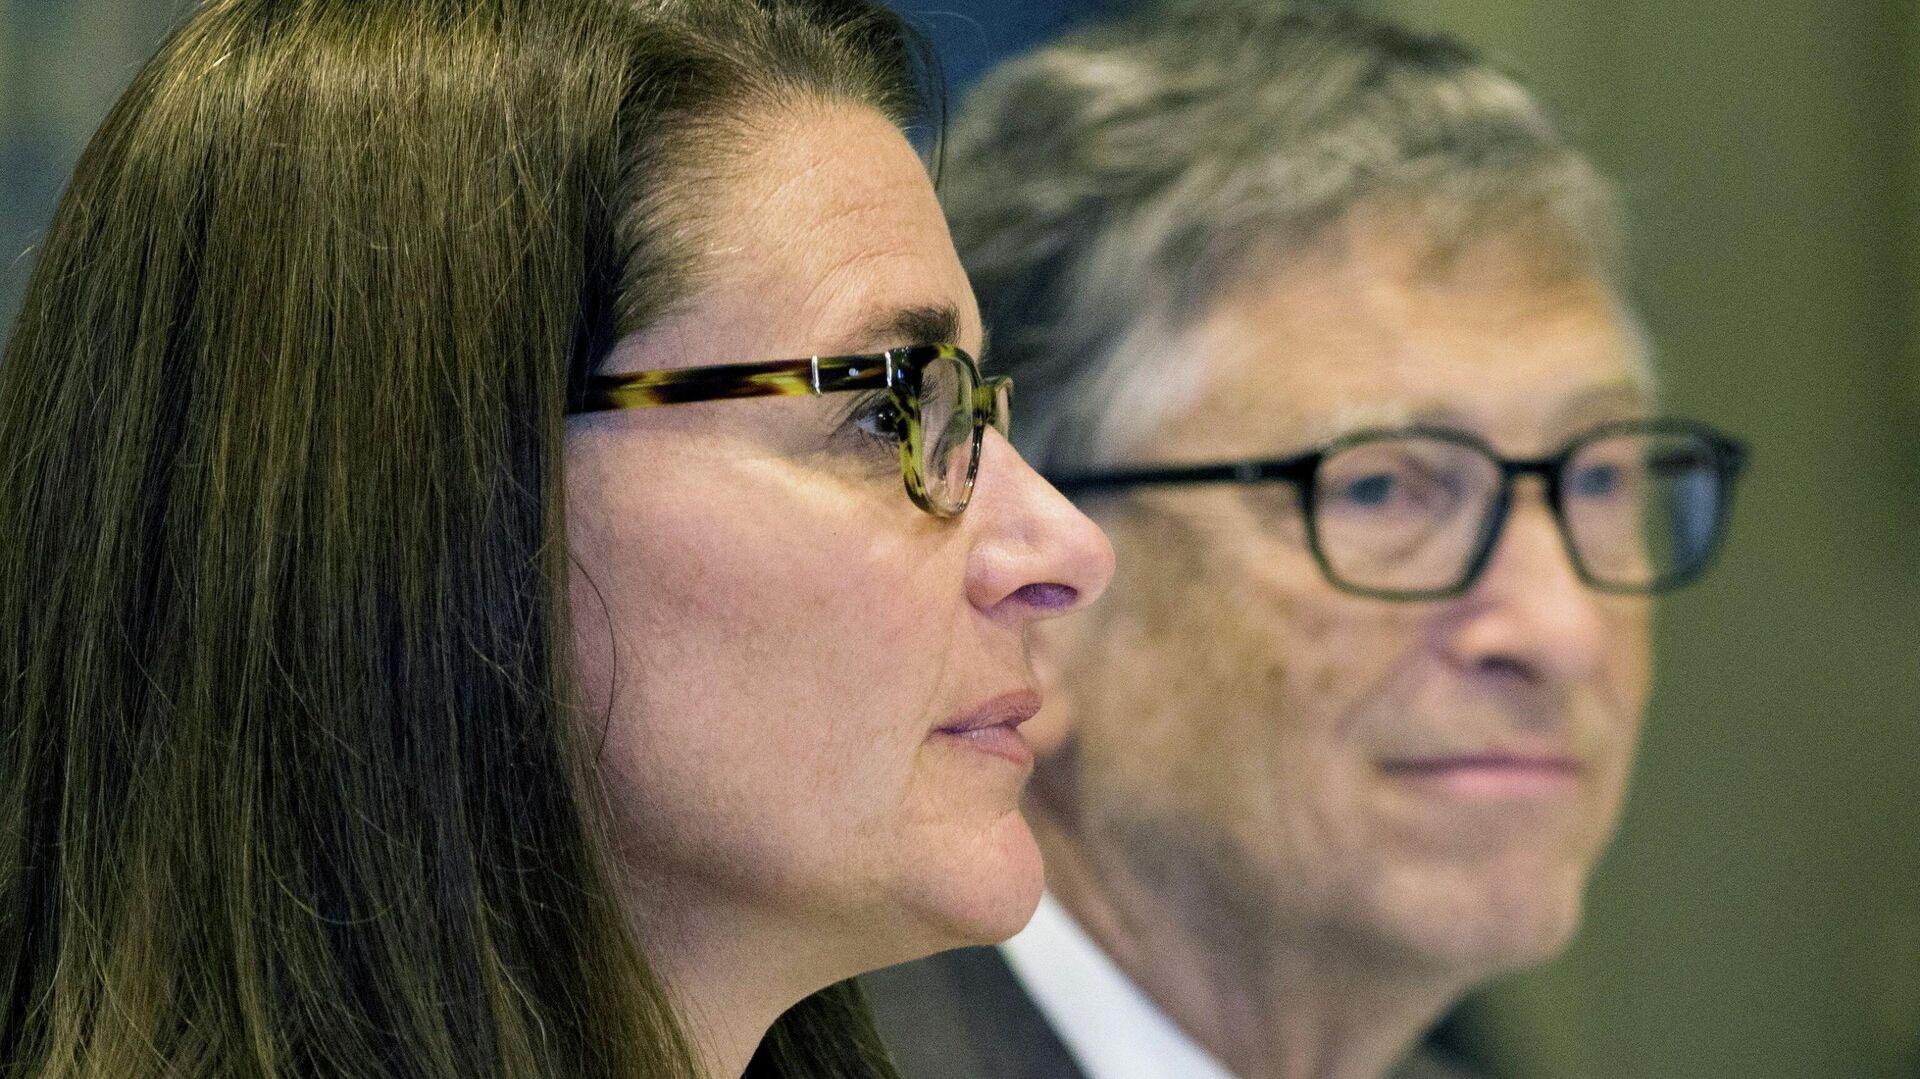 Melinda y Bill Gates, filántropos estadounidenses - Sputnik Mundo, 1920, 05.08.2021